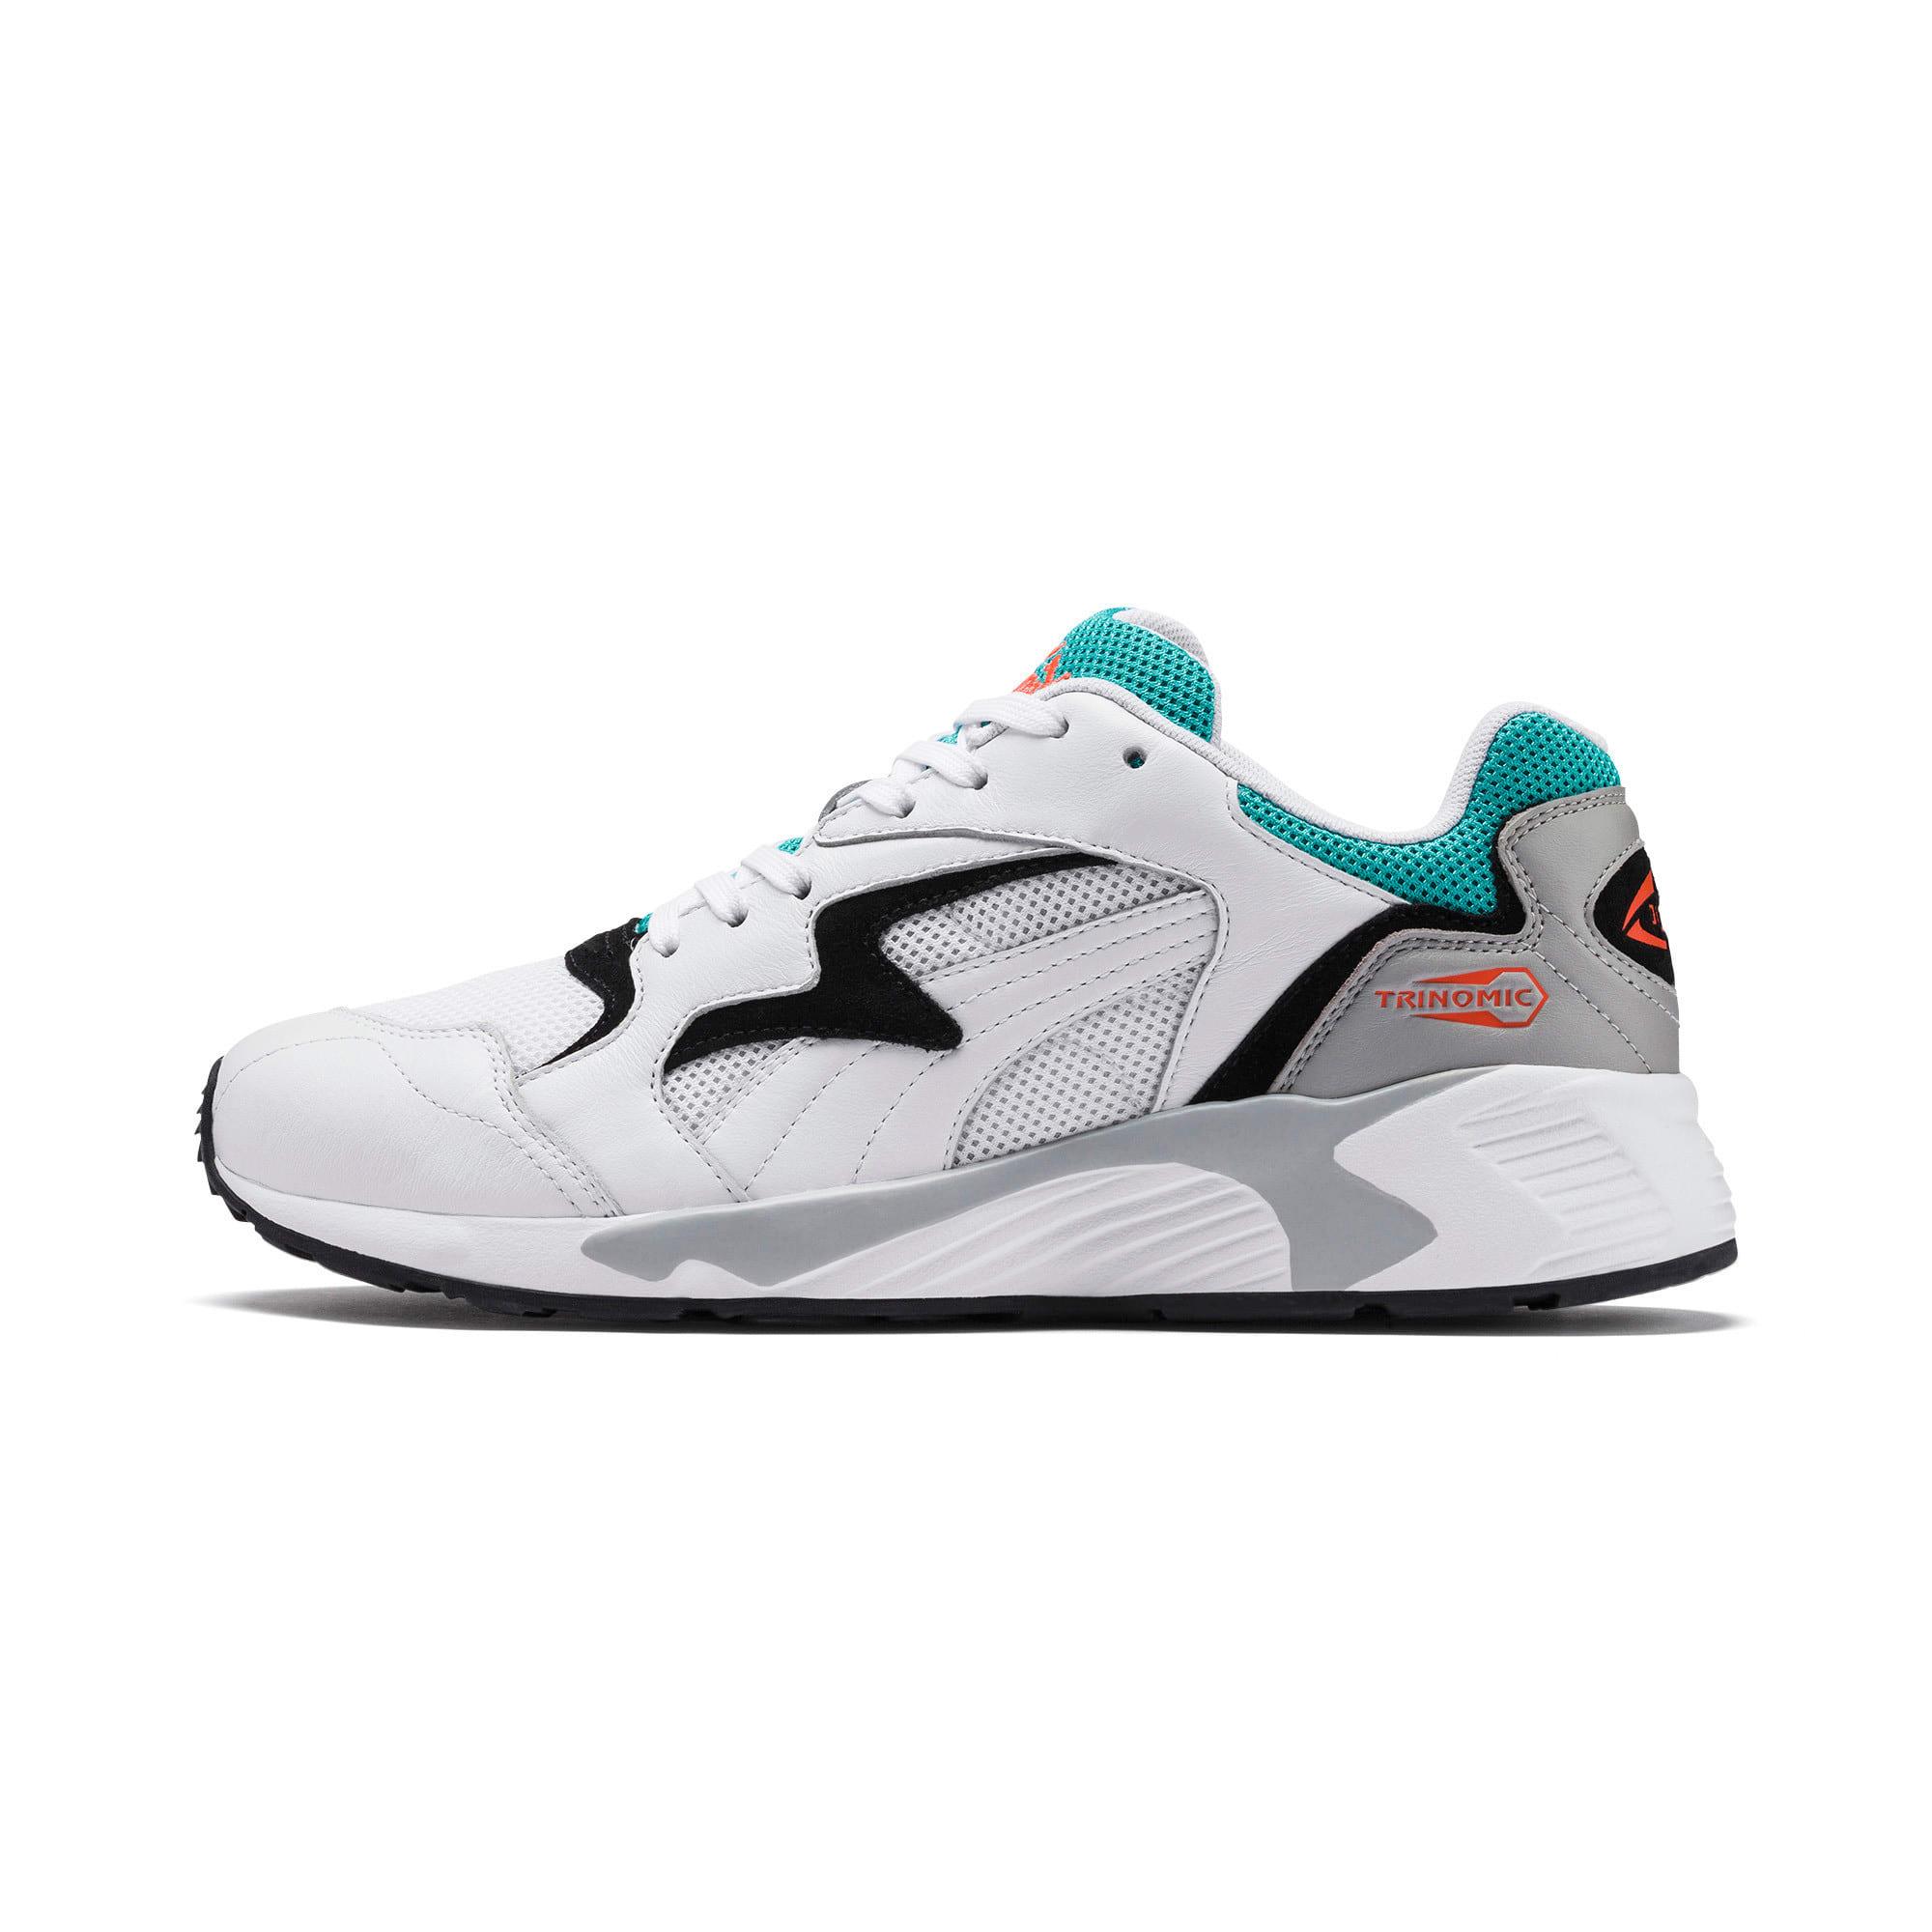 Thumbnail 1 of Prevail Classic Sneakers, Puma White-Blue Turquoise, medium